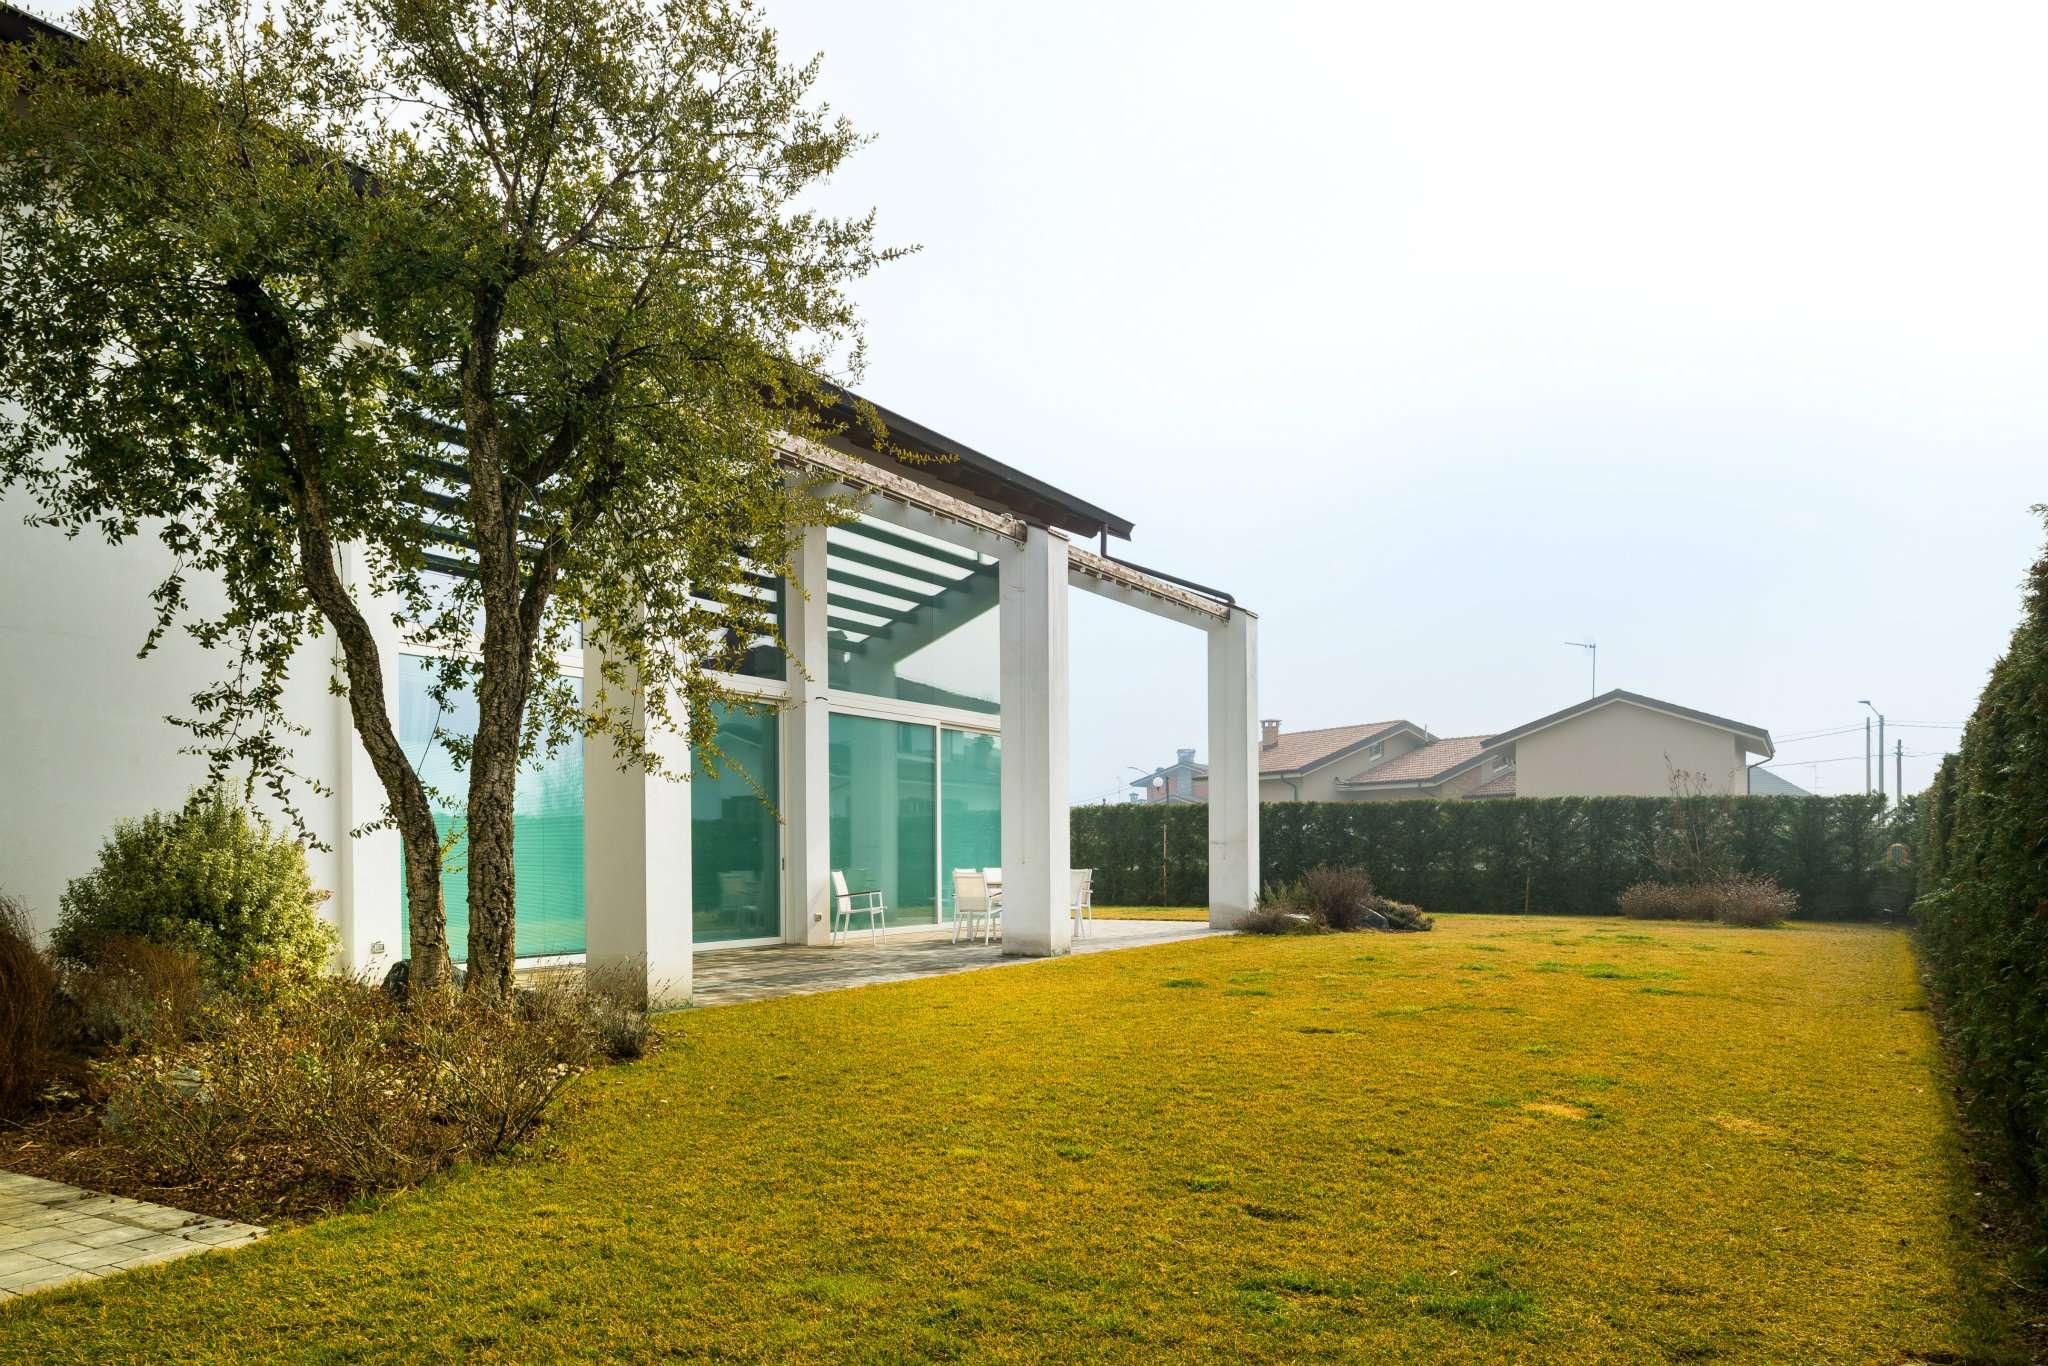 Villa in Vendita a Villafranca Piemonte: 440 mq